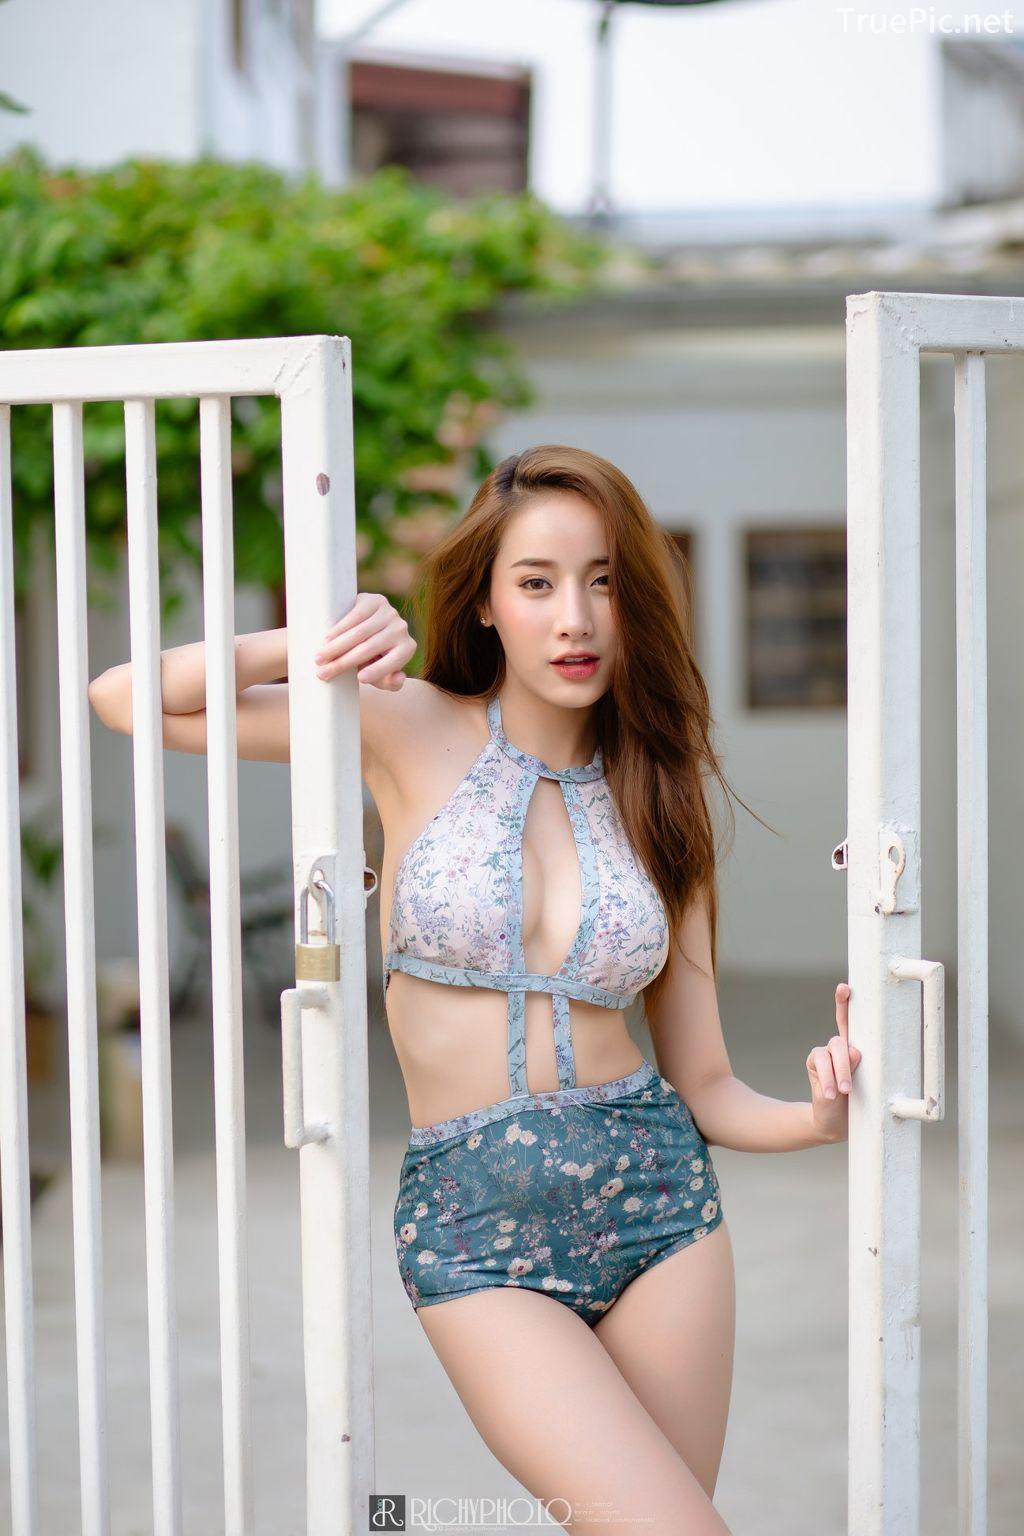 Image-Thailand-Sexy-Model-Pichana-Yoosuk-Album-Remember-The-Sea-TruePic.net- Picture-6